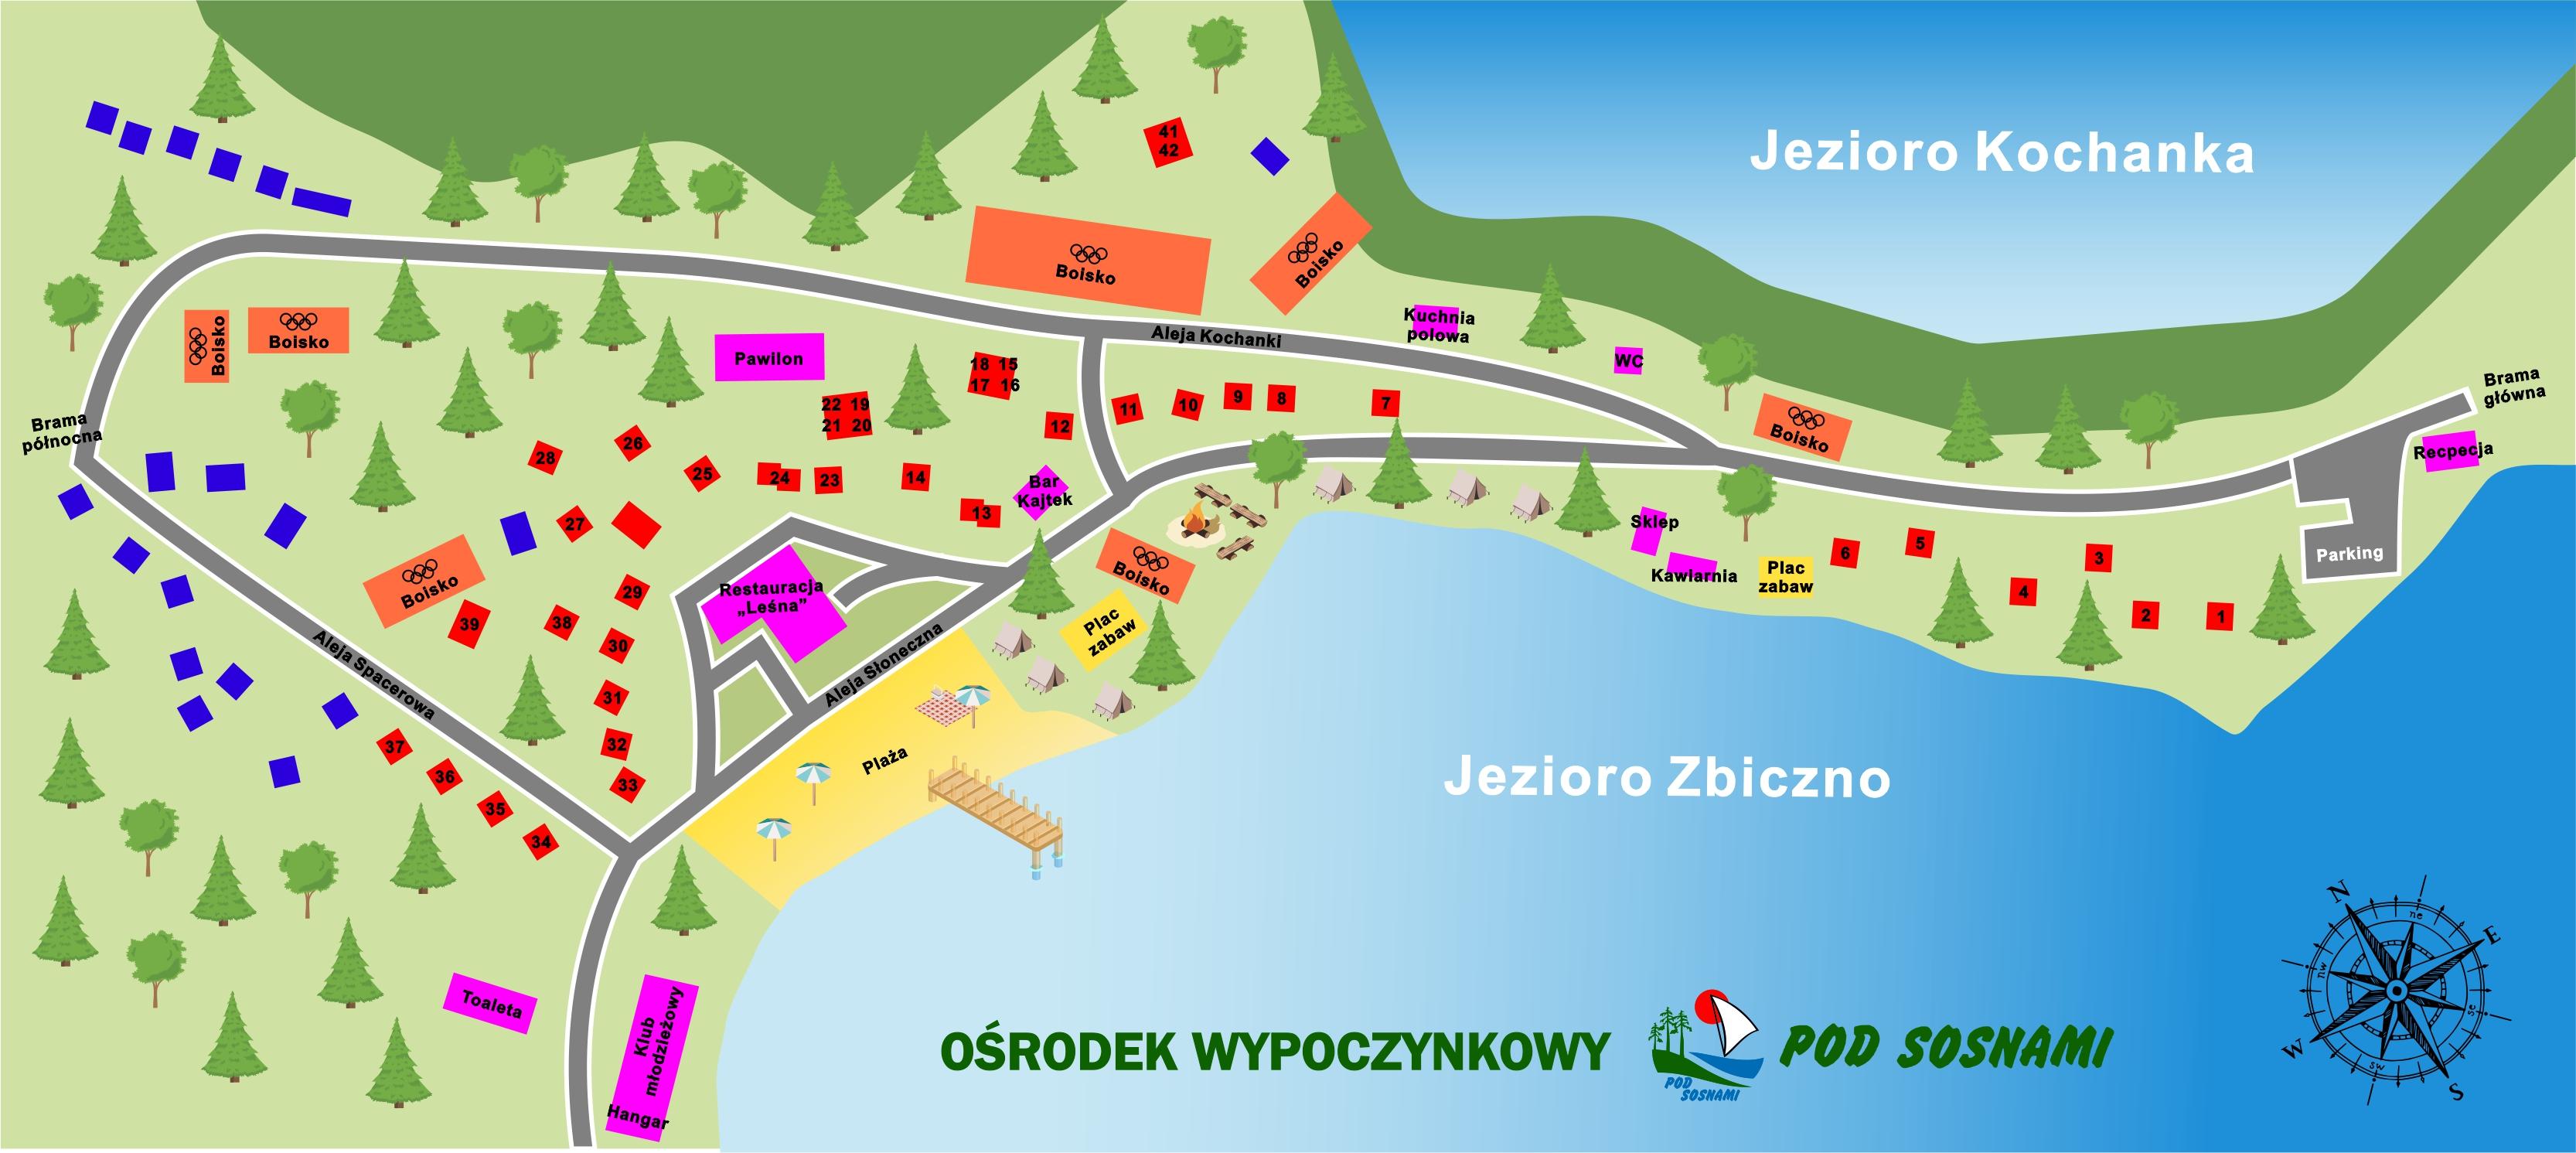 Mapa ośrodka Pod Sosnami